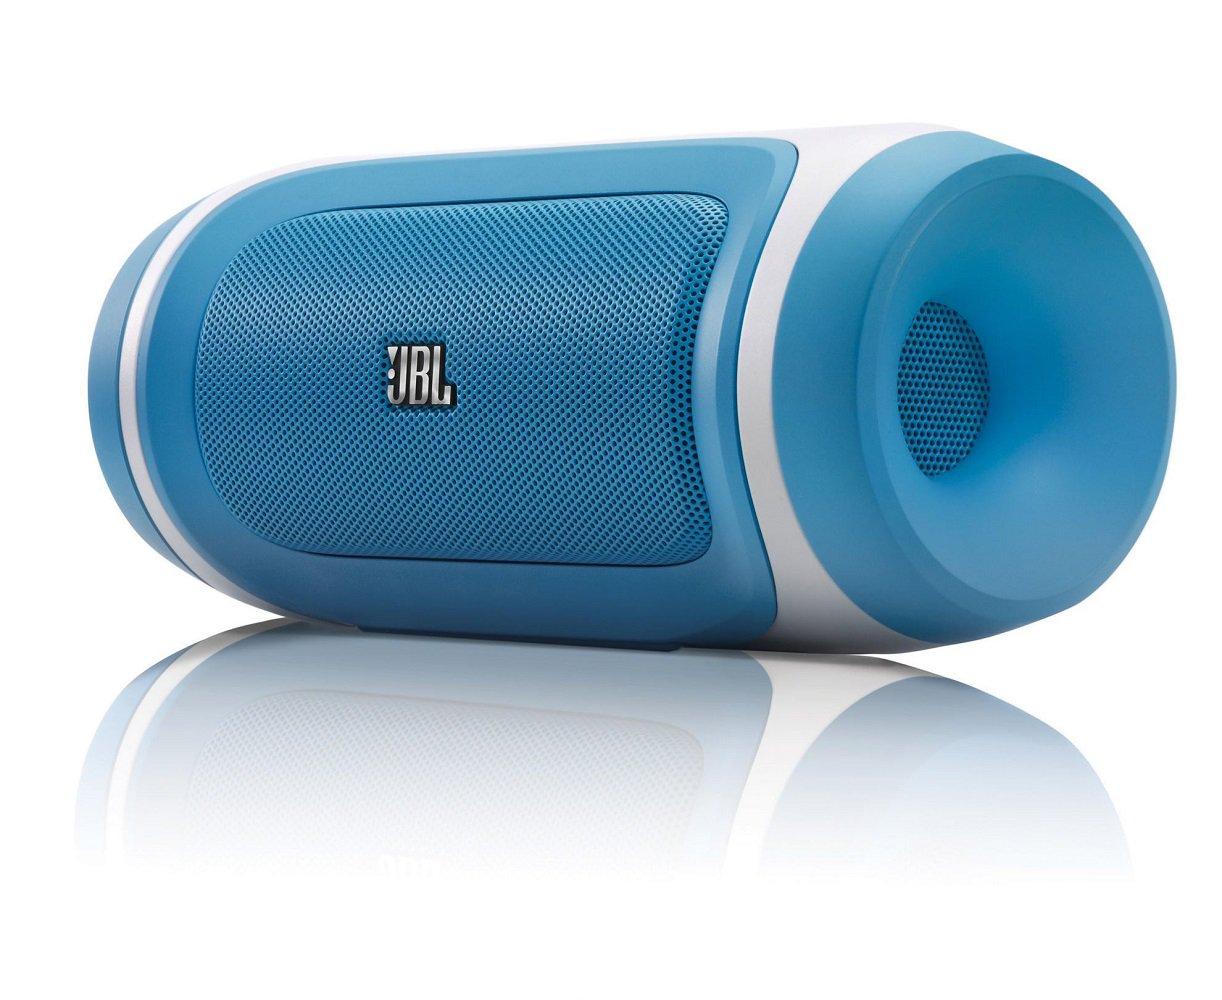 JBL Charge, alto falante bluetooth